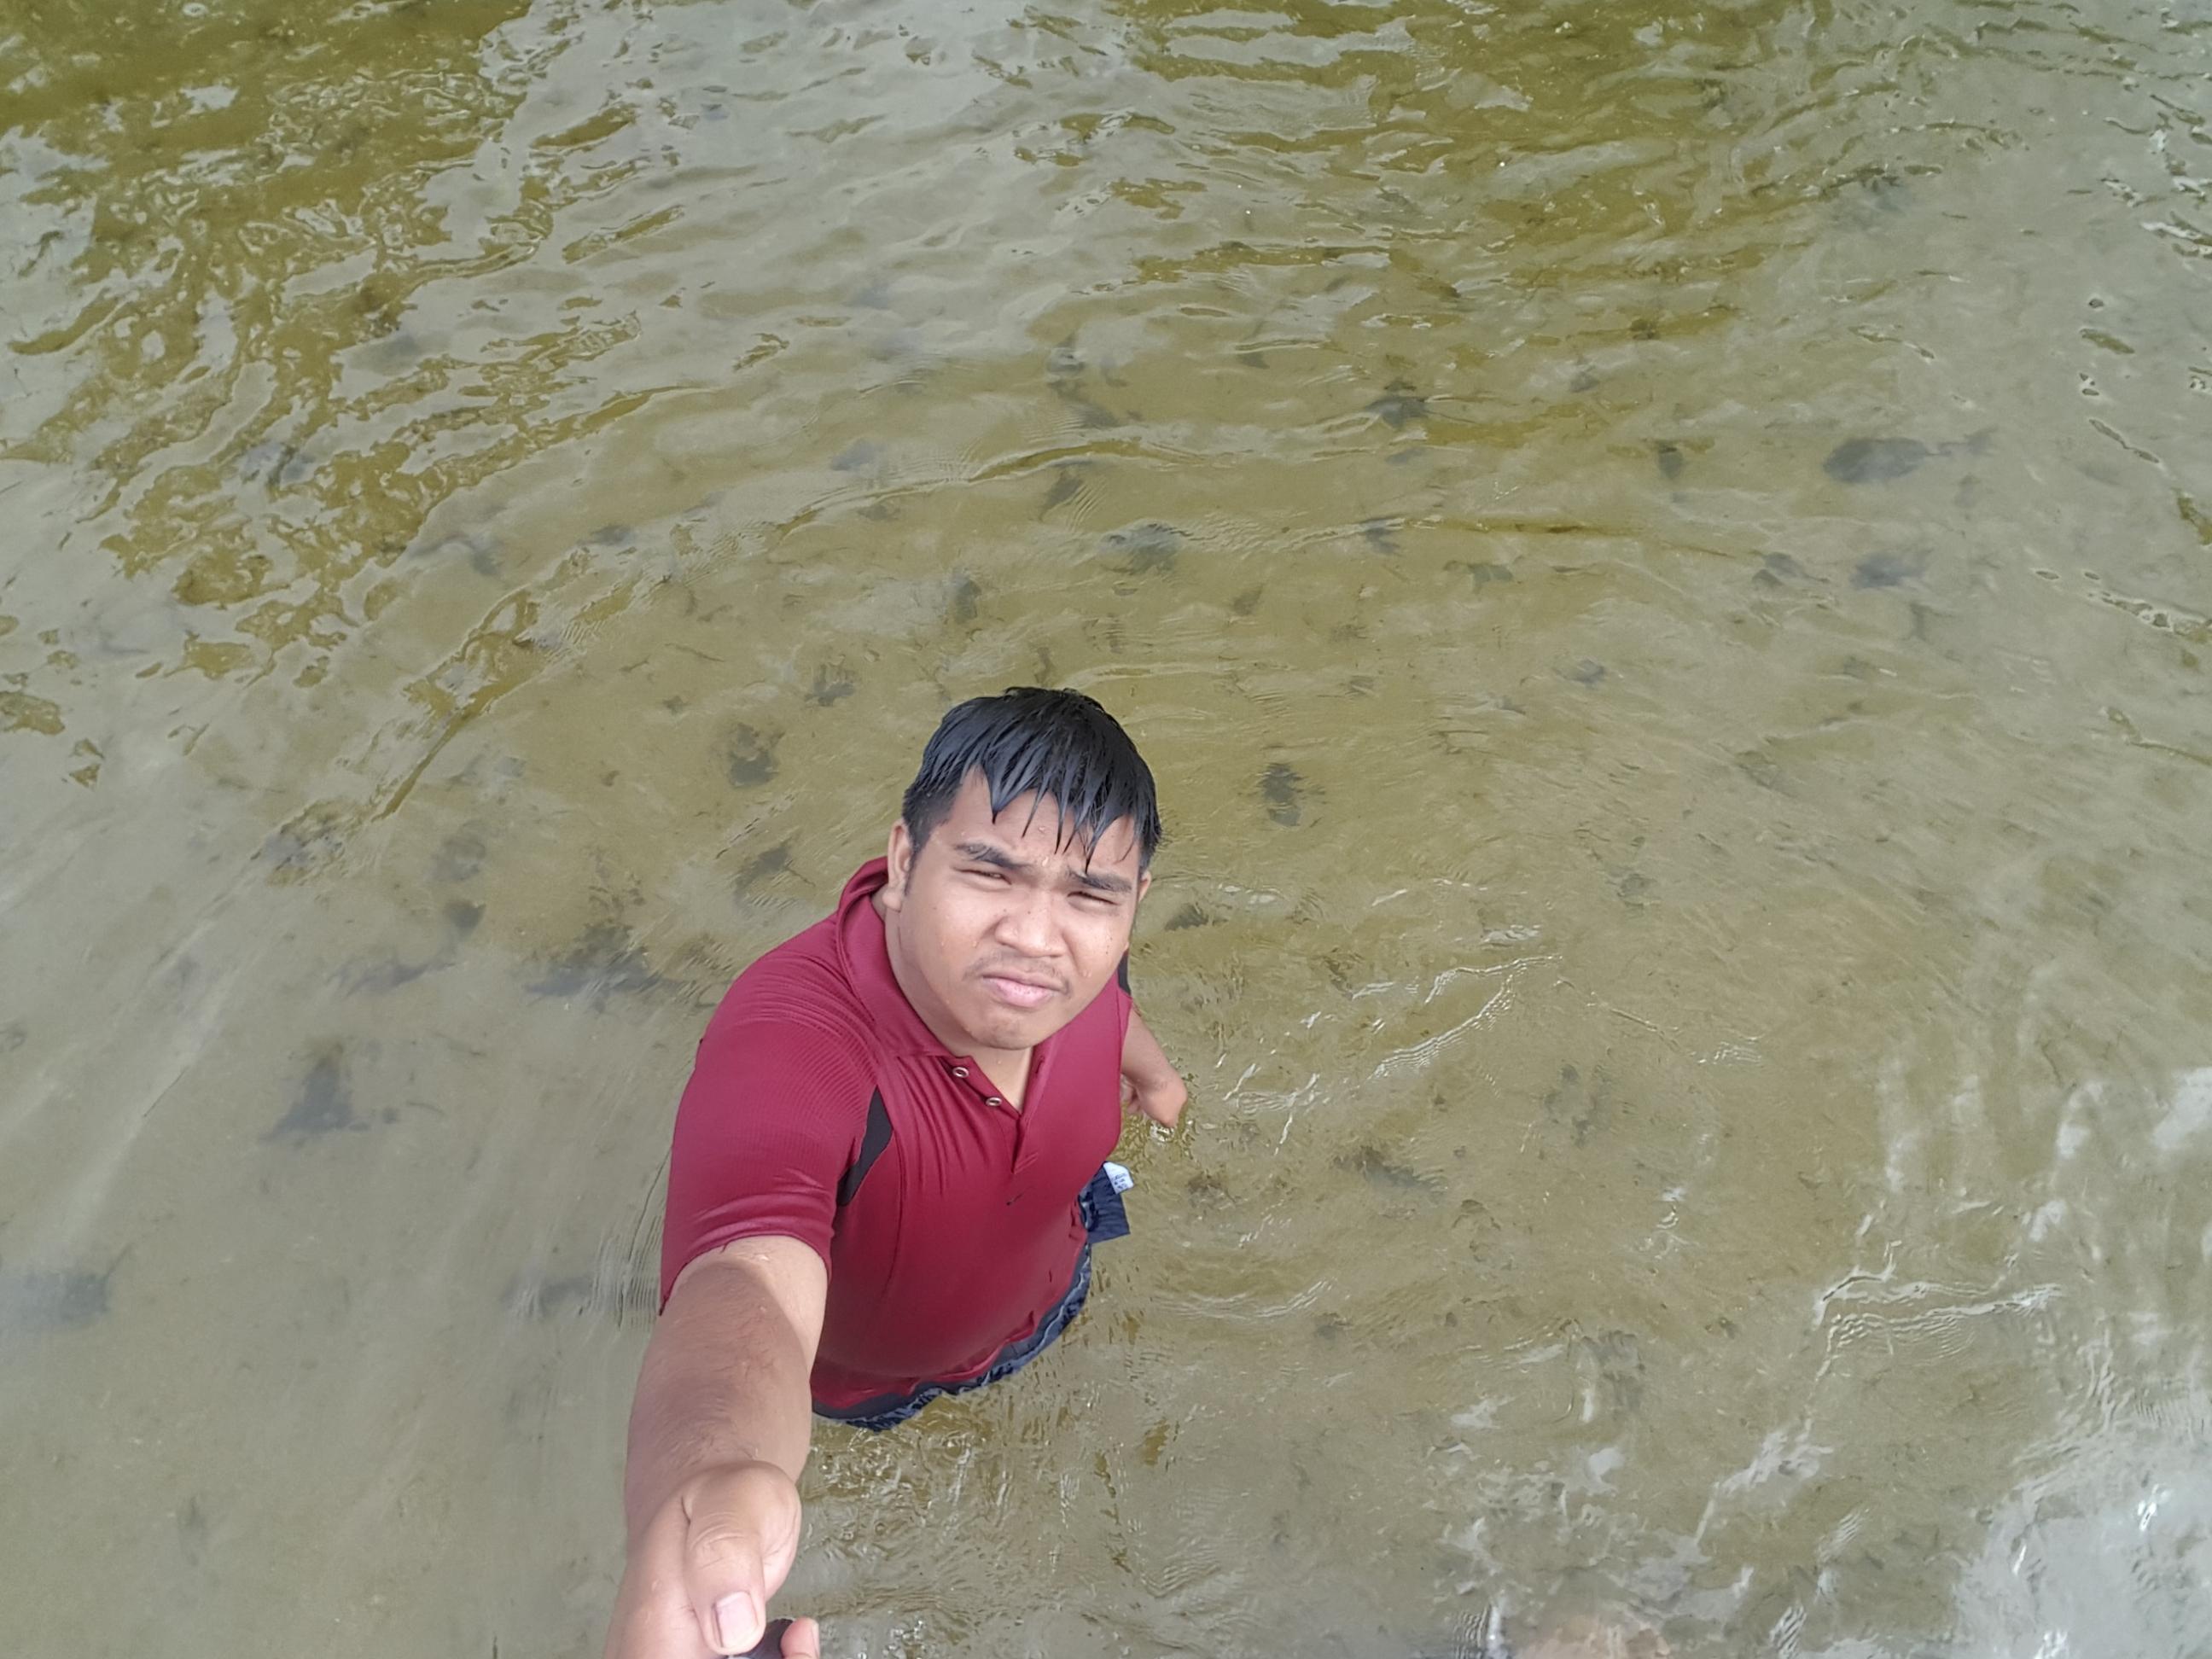 Air terjun Sedim 2